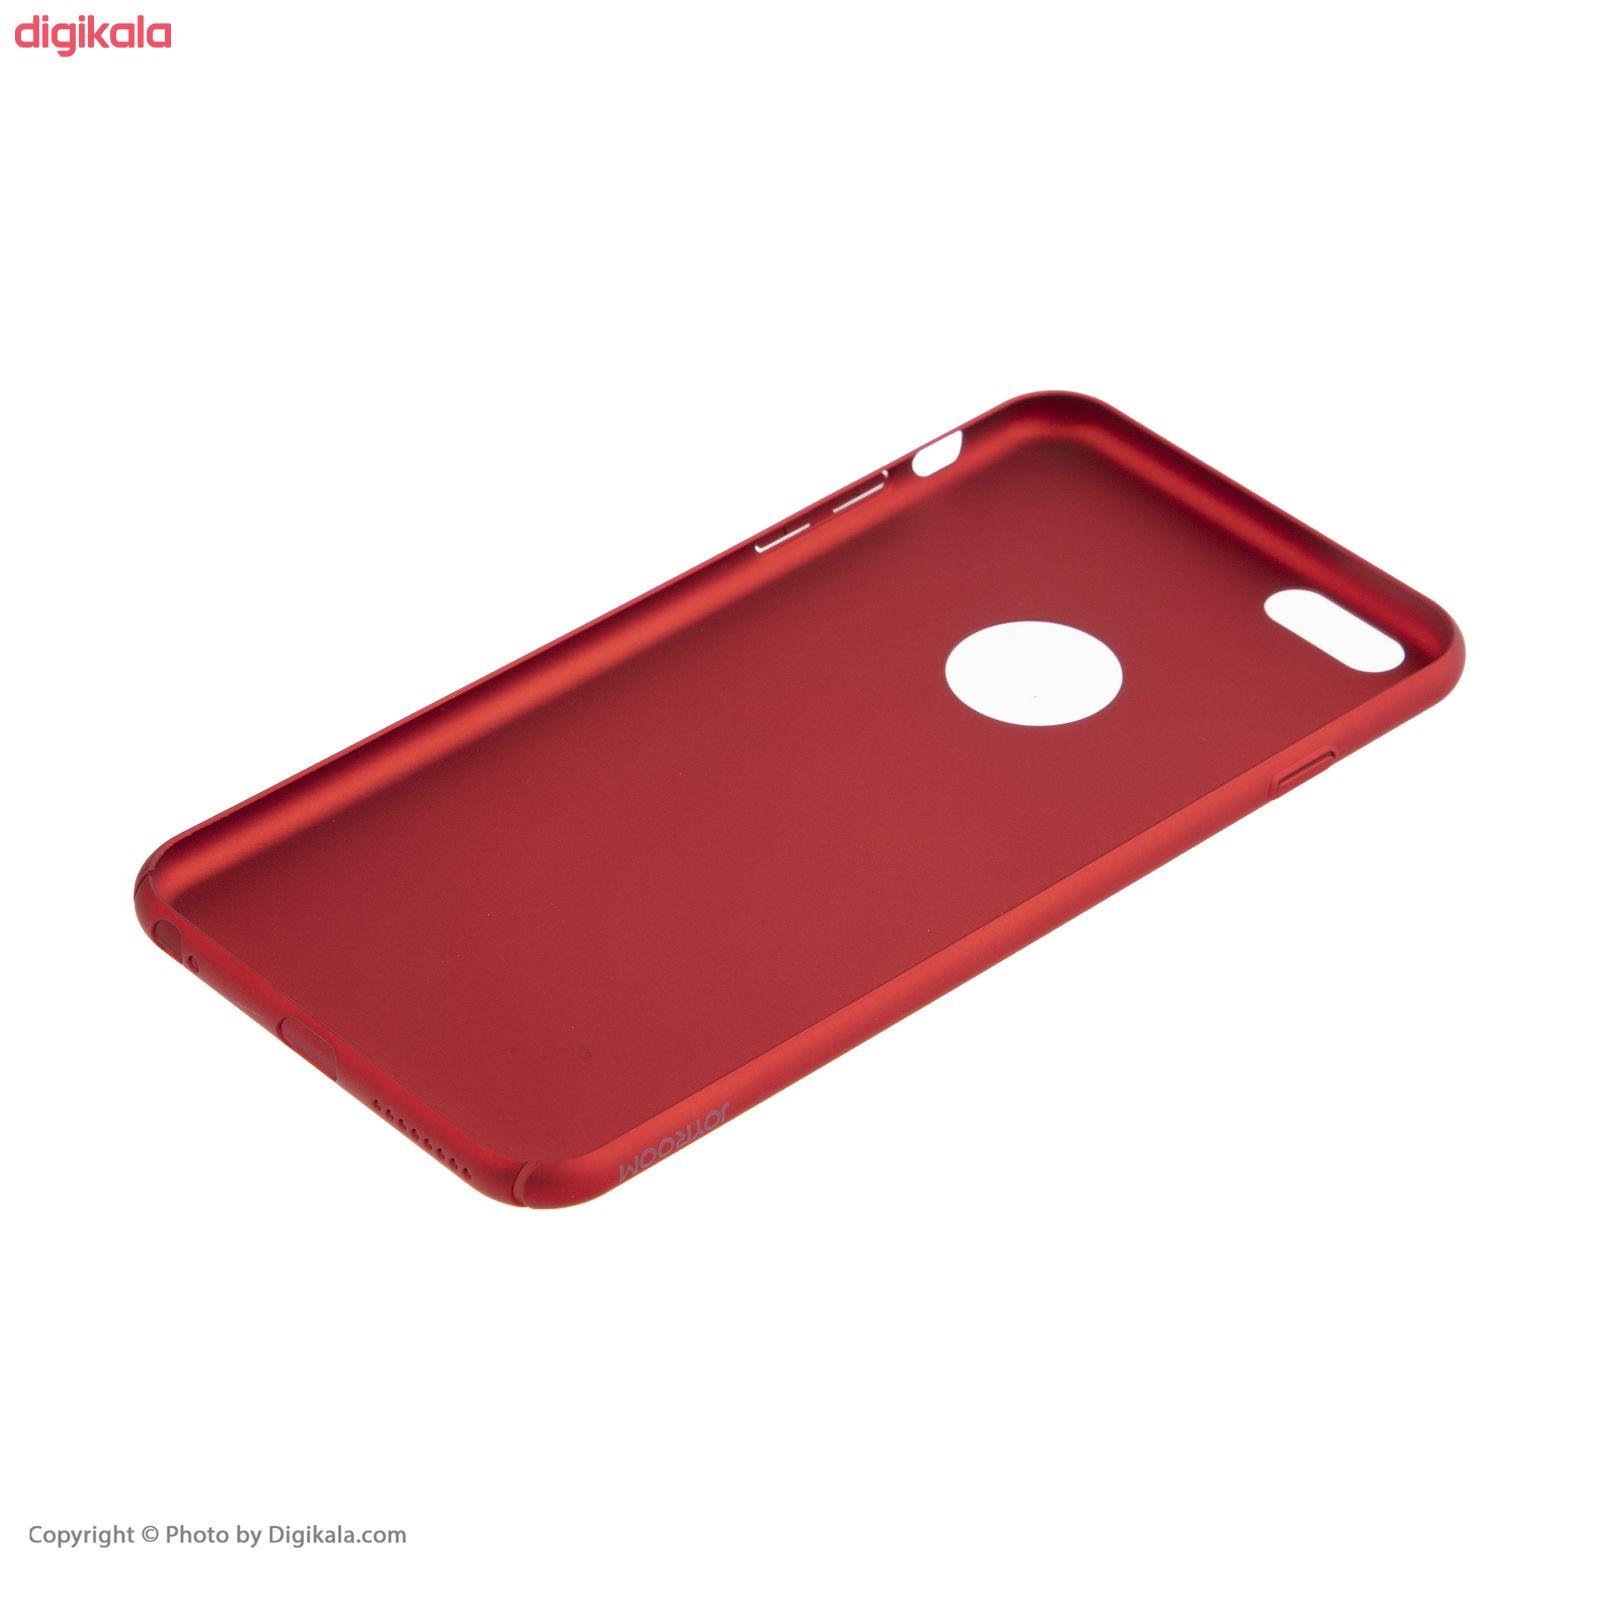 کاور جوی روم مدل JR-BP157 مناسب برای گوشی موبایل اپل iPhone 6 plus/6s plus  main 1 5